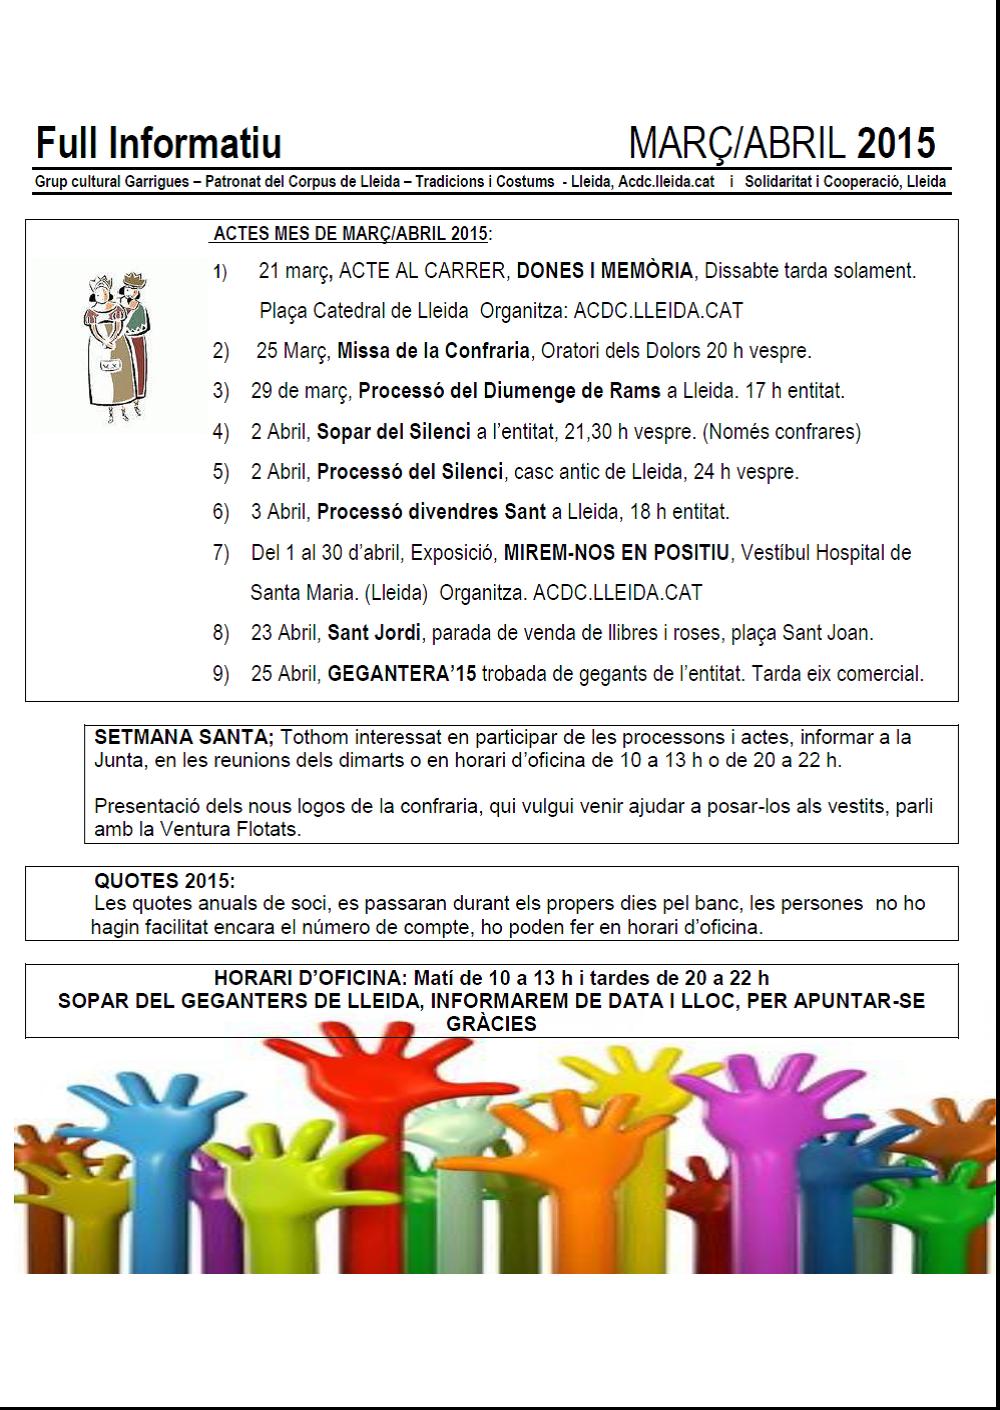 FULL INFORMATIU MARÇ/ABRIL 2015